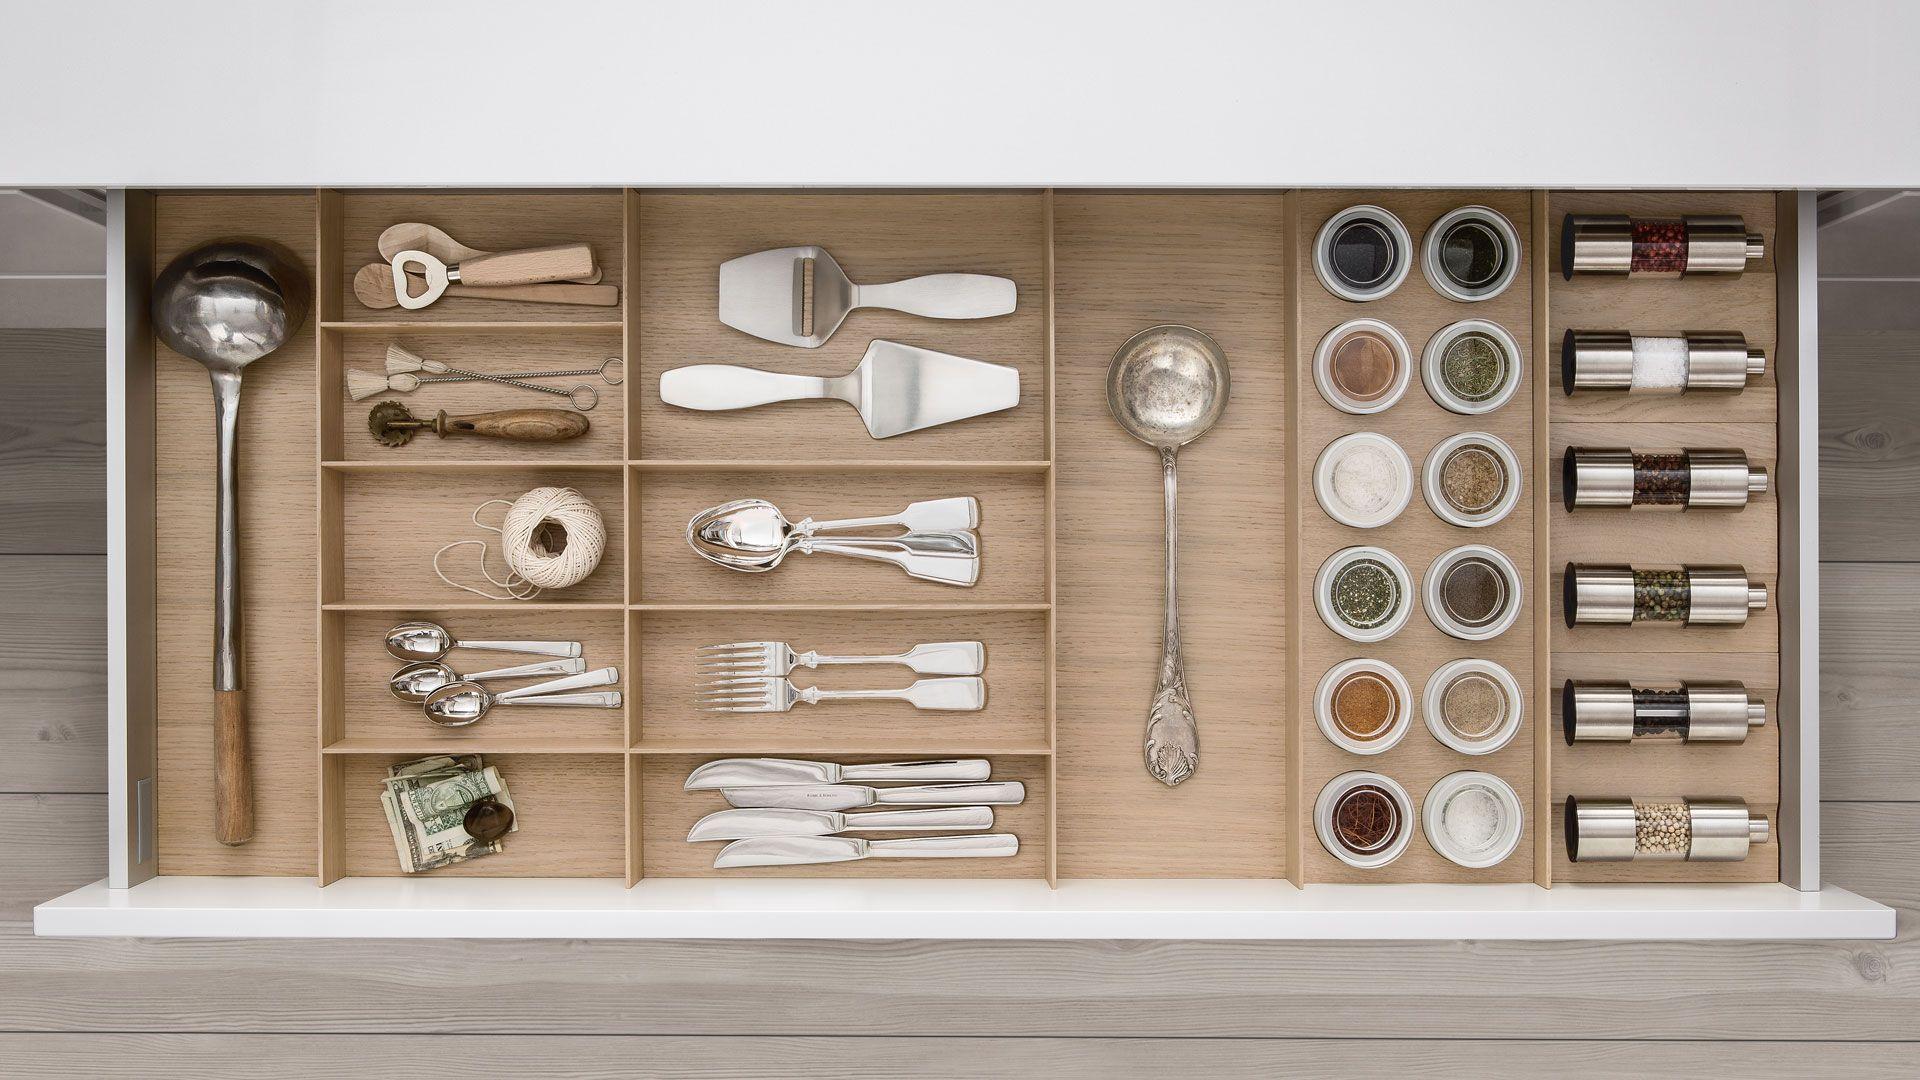 Interior Solutions Kitchens Siematic Ka 1 4 Chen Innenausstattung Siematic Kuchnia Detale